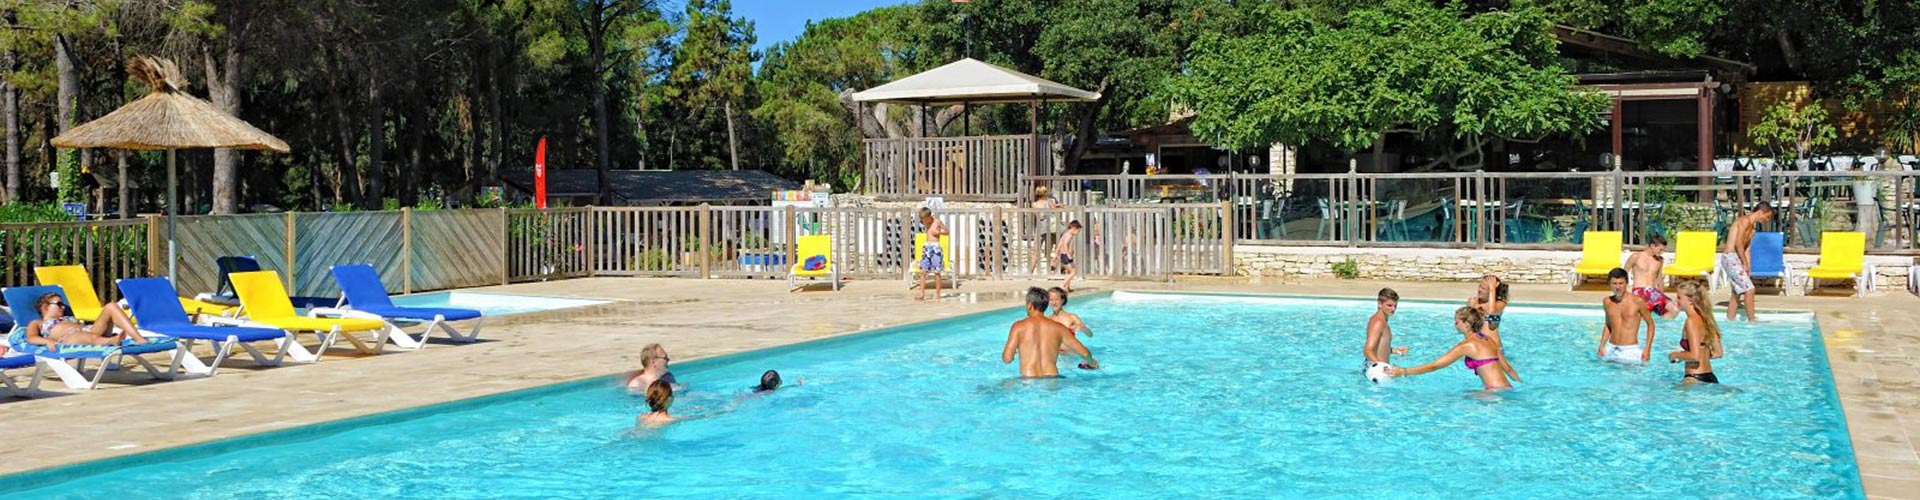 camping corse du sud bord de mer avec piscine et 3 toiles